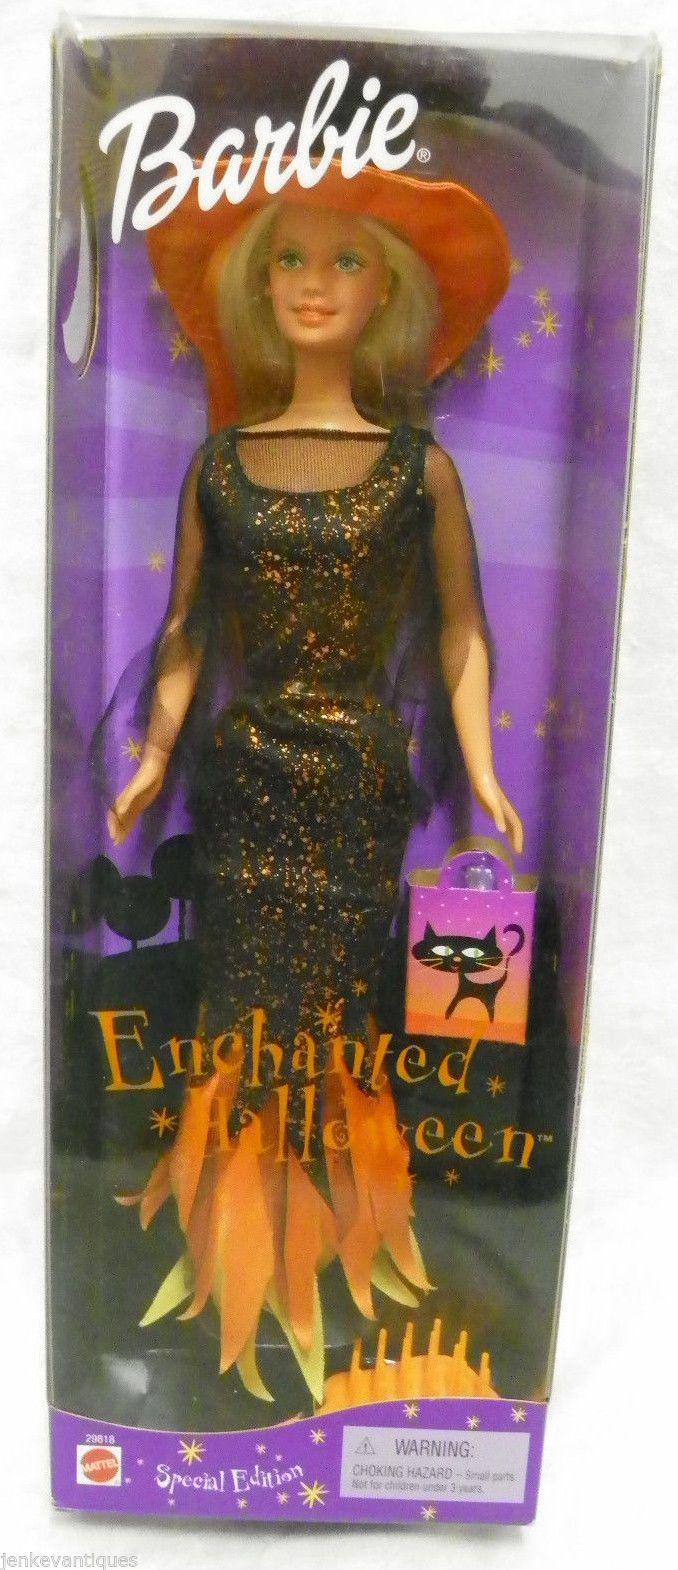 Enchanted Halloween Barbie Doll 2000 Mattel - NRFB   eBay